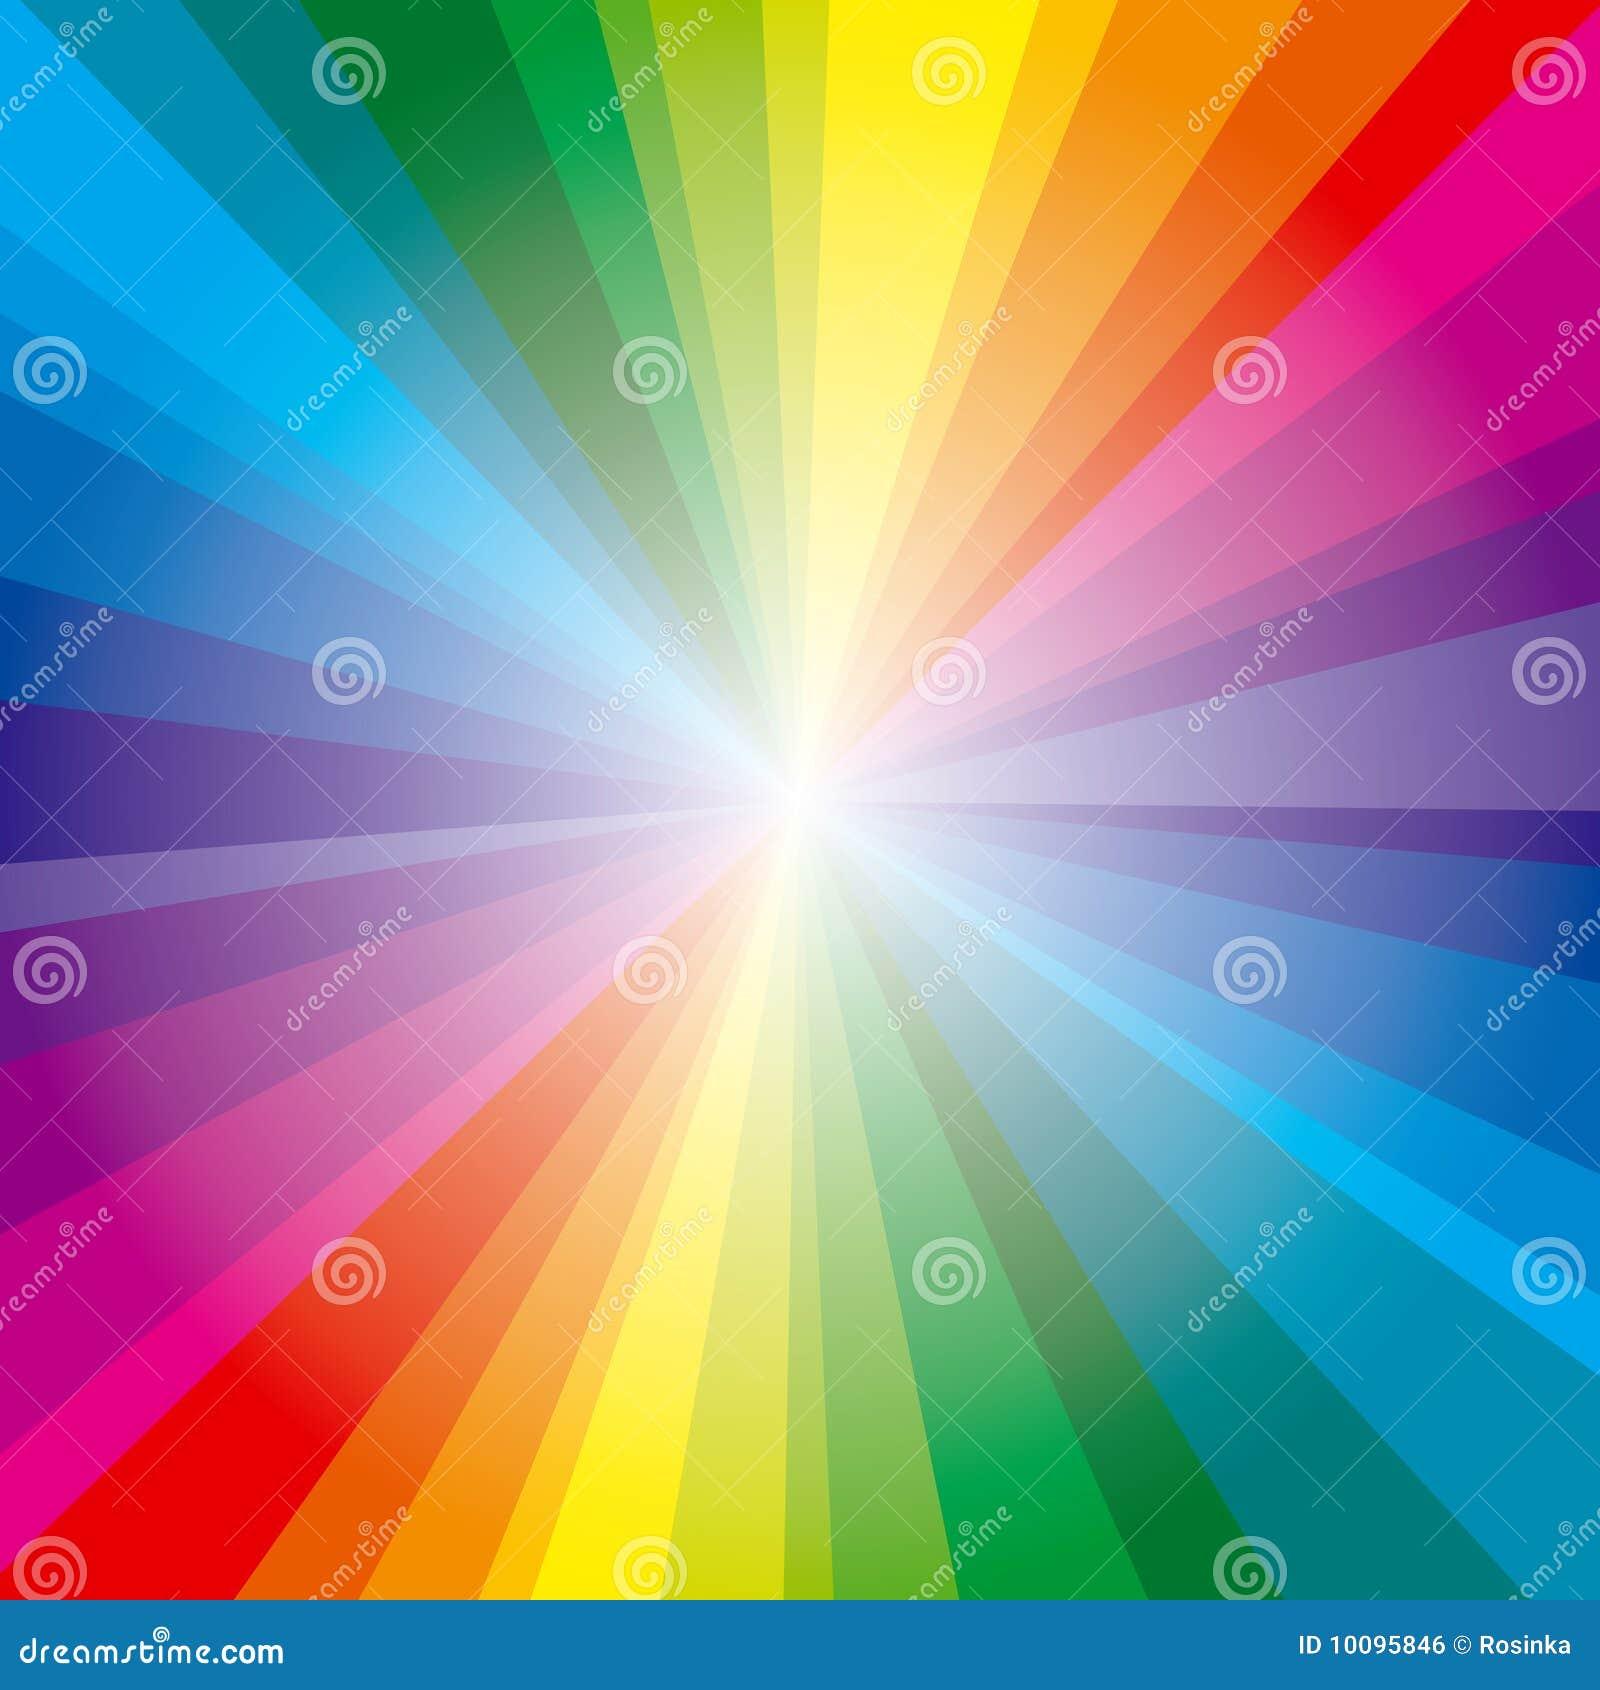 spectrum of light background - photo #35